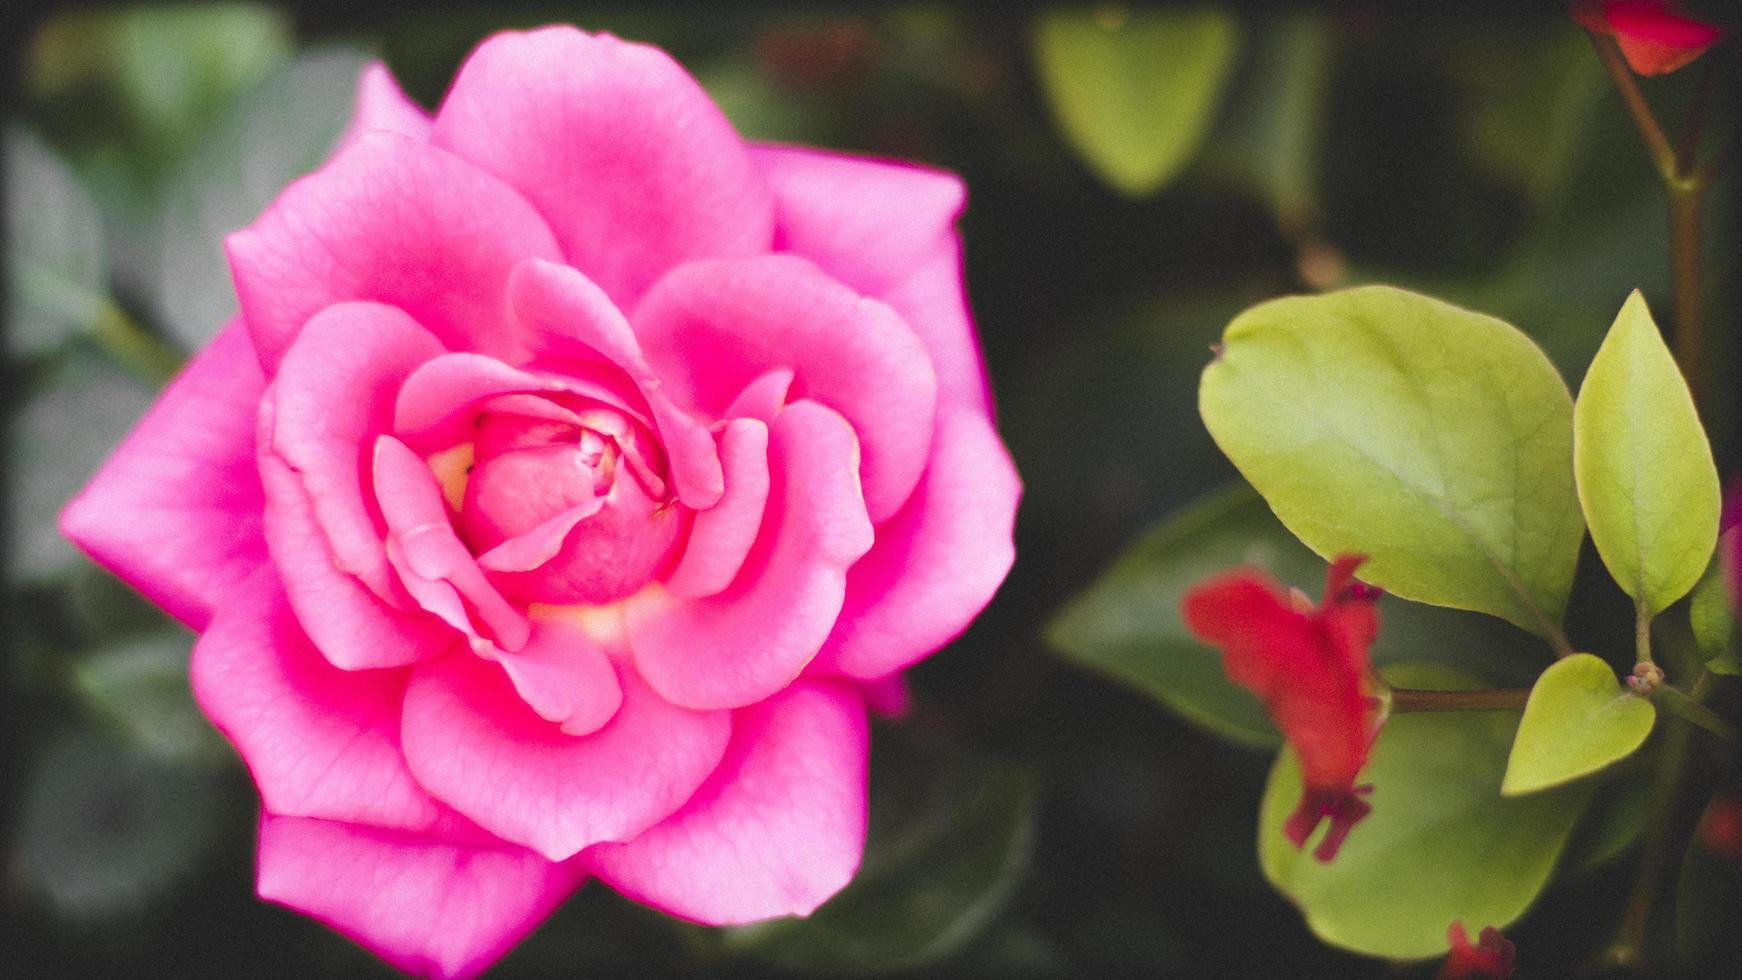 gros plan, de, a, rose rose photo